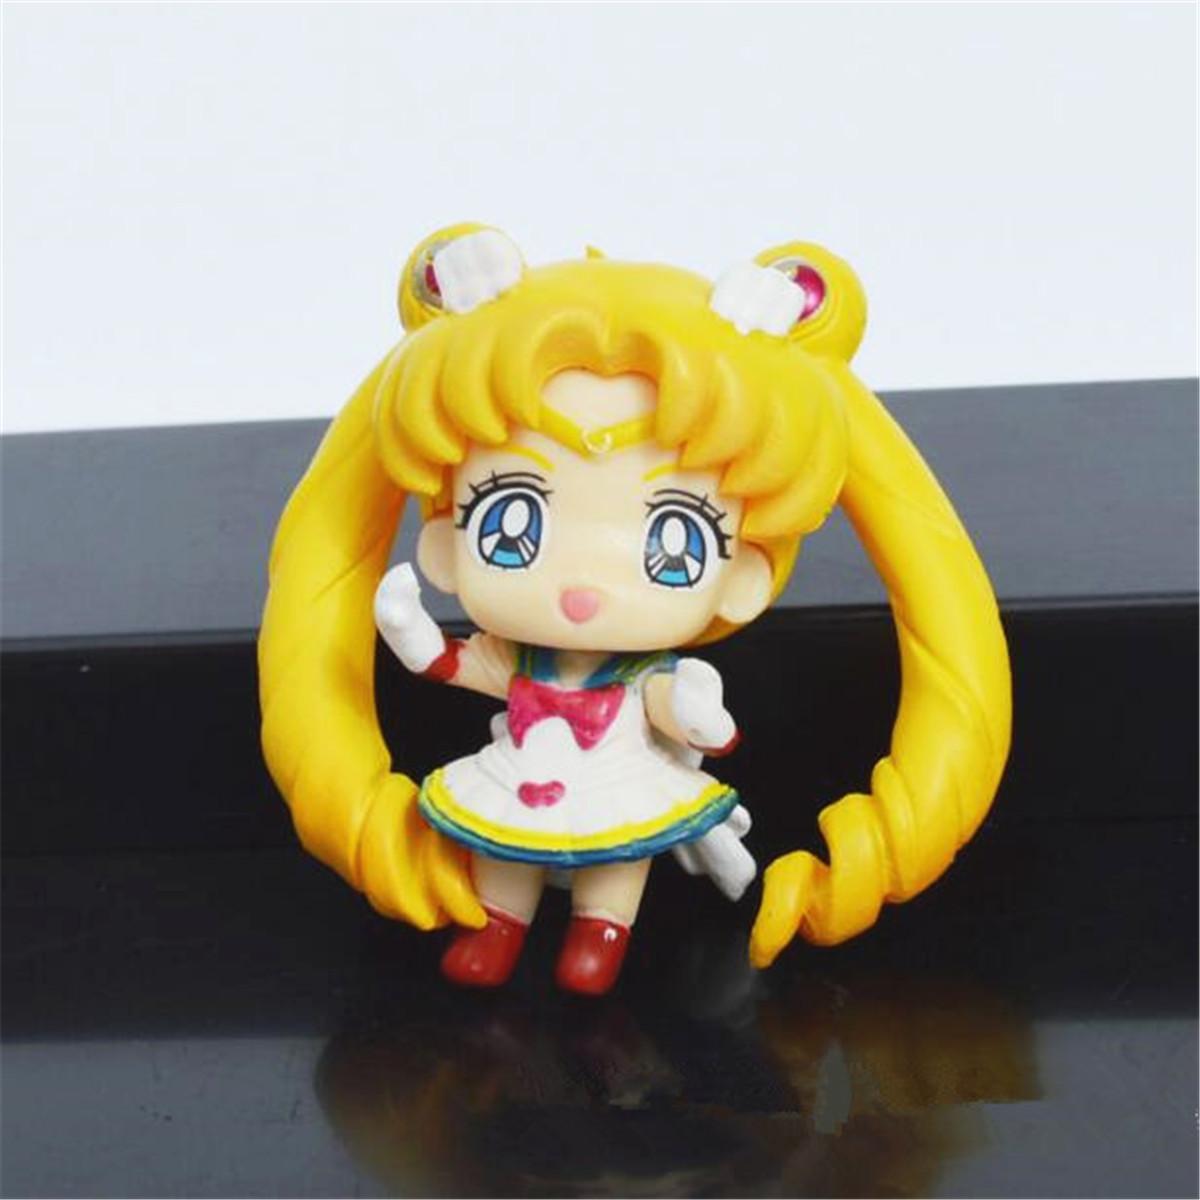 Sailor Moon S.H.Figuarts Tsukino Usagi Action Model Figurine Anime Figma Decor